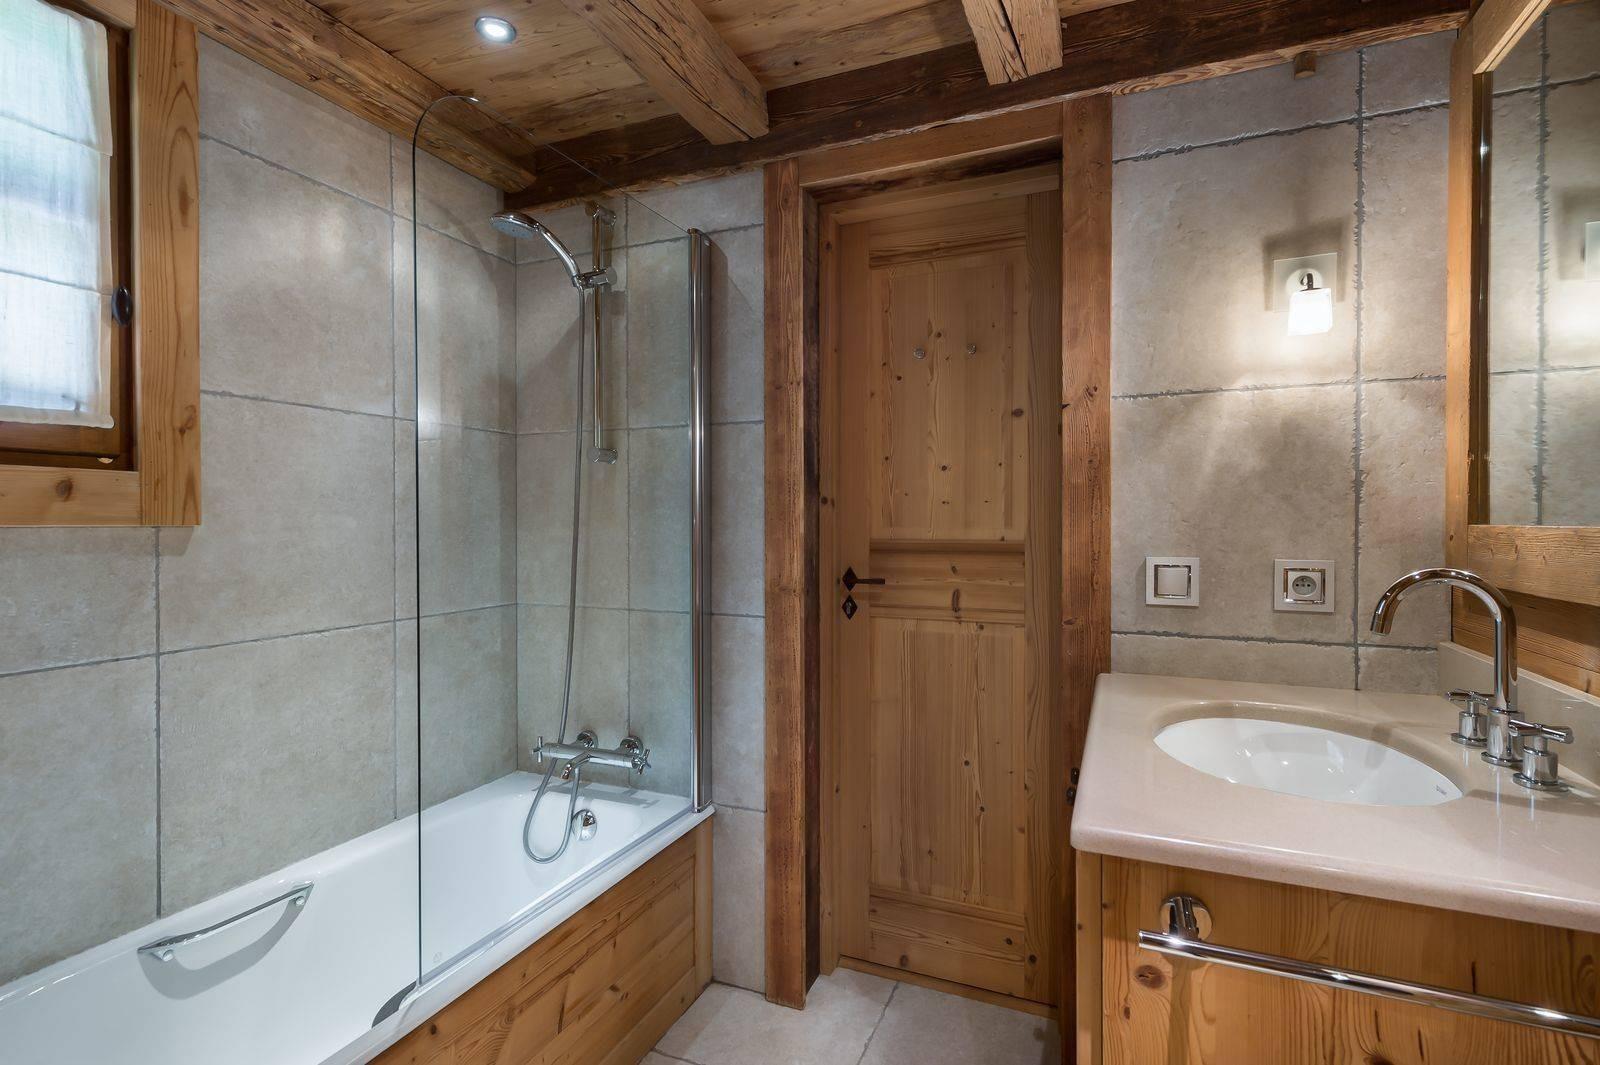 Courchevel 1550 Luxury Rental Chalet Niuréole Bathroom 3